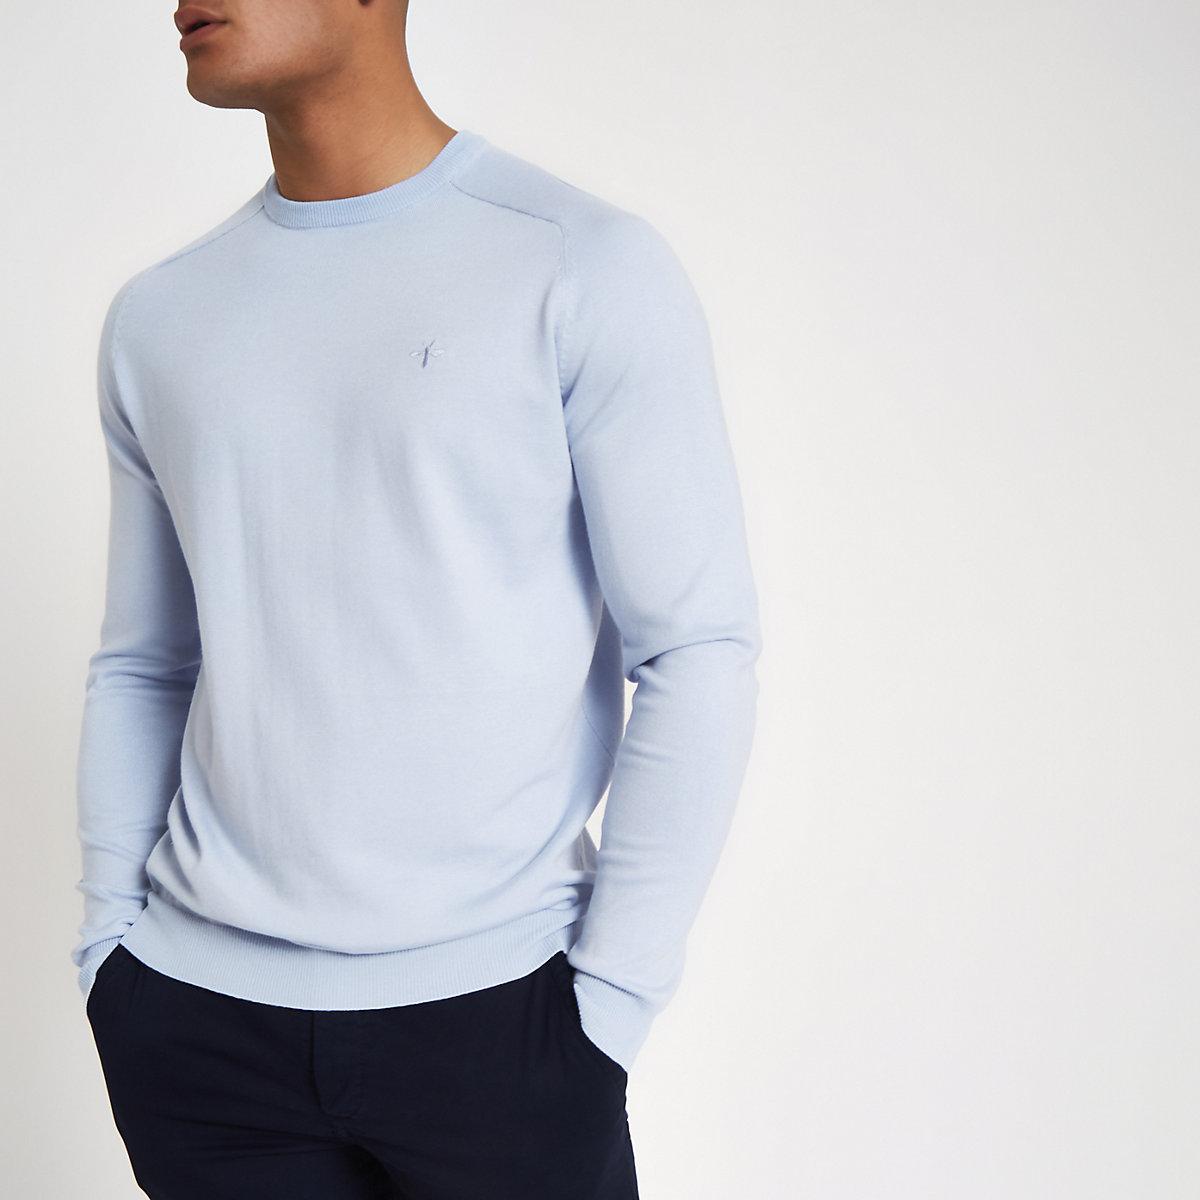 Light blue slim fit crew neck sweater